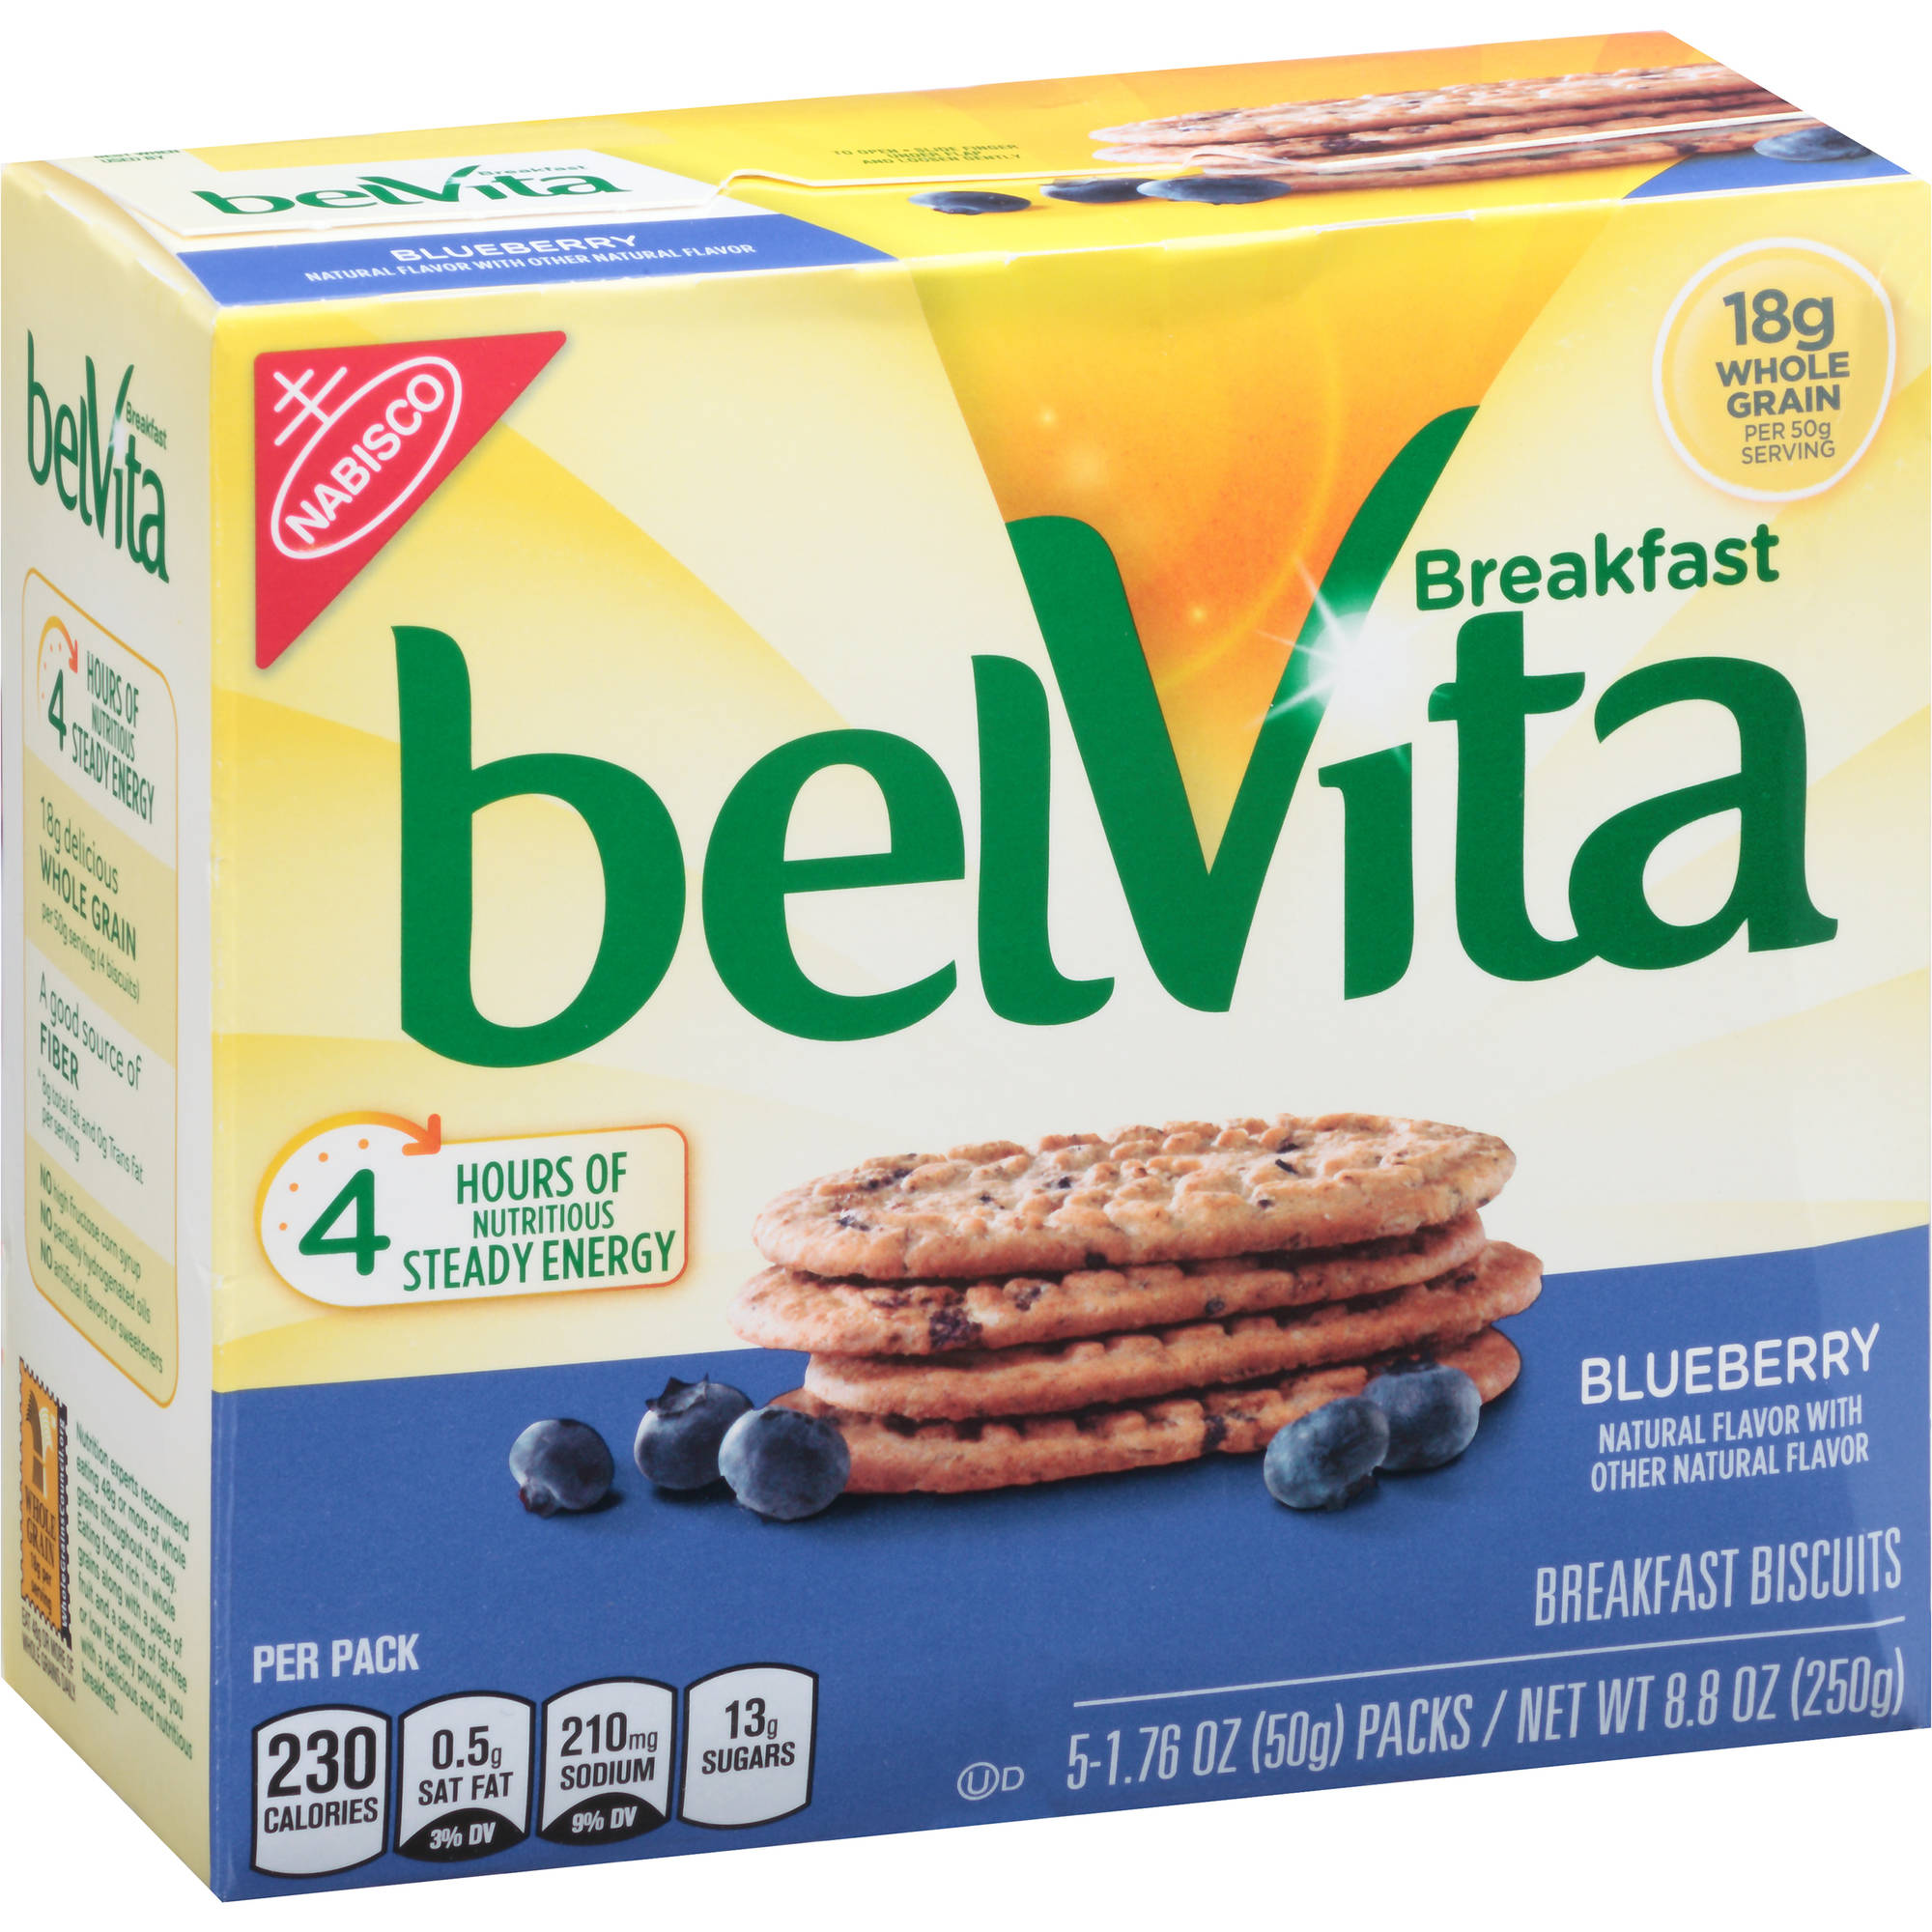 Nabisco belVita Blueberry Breakfast Biscuits, 1.76 oz, 5 count